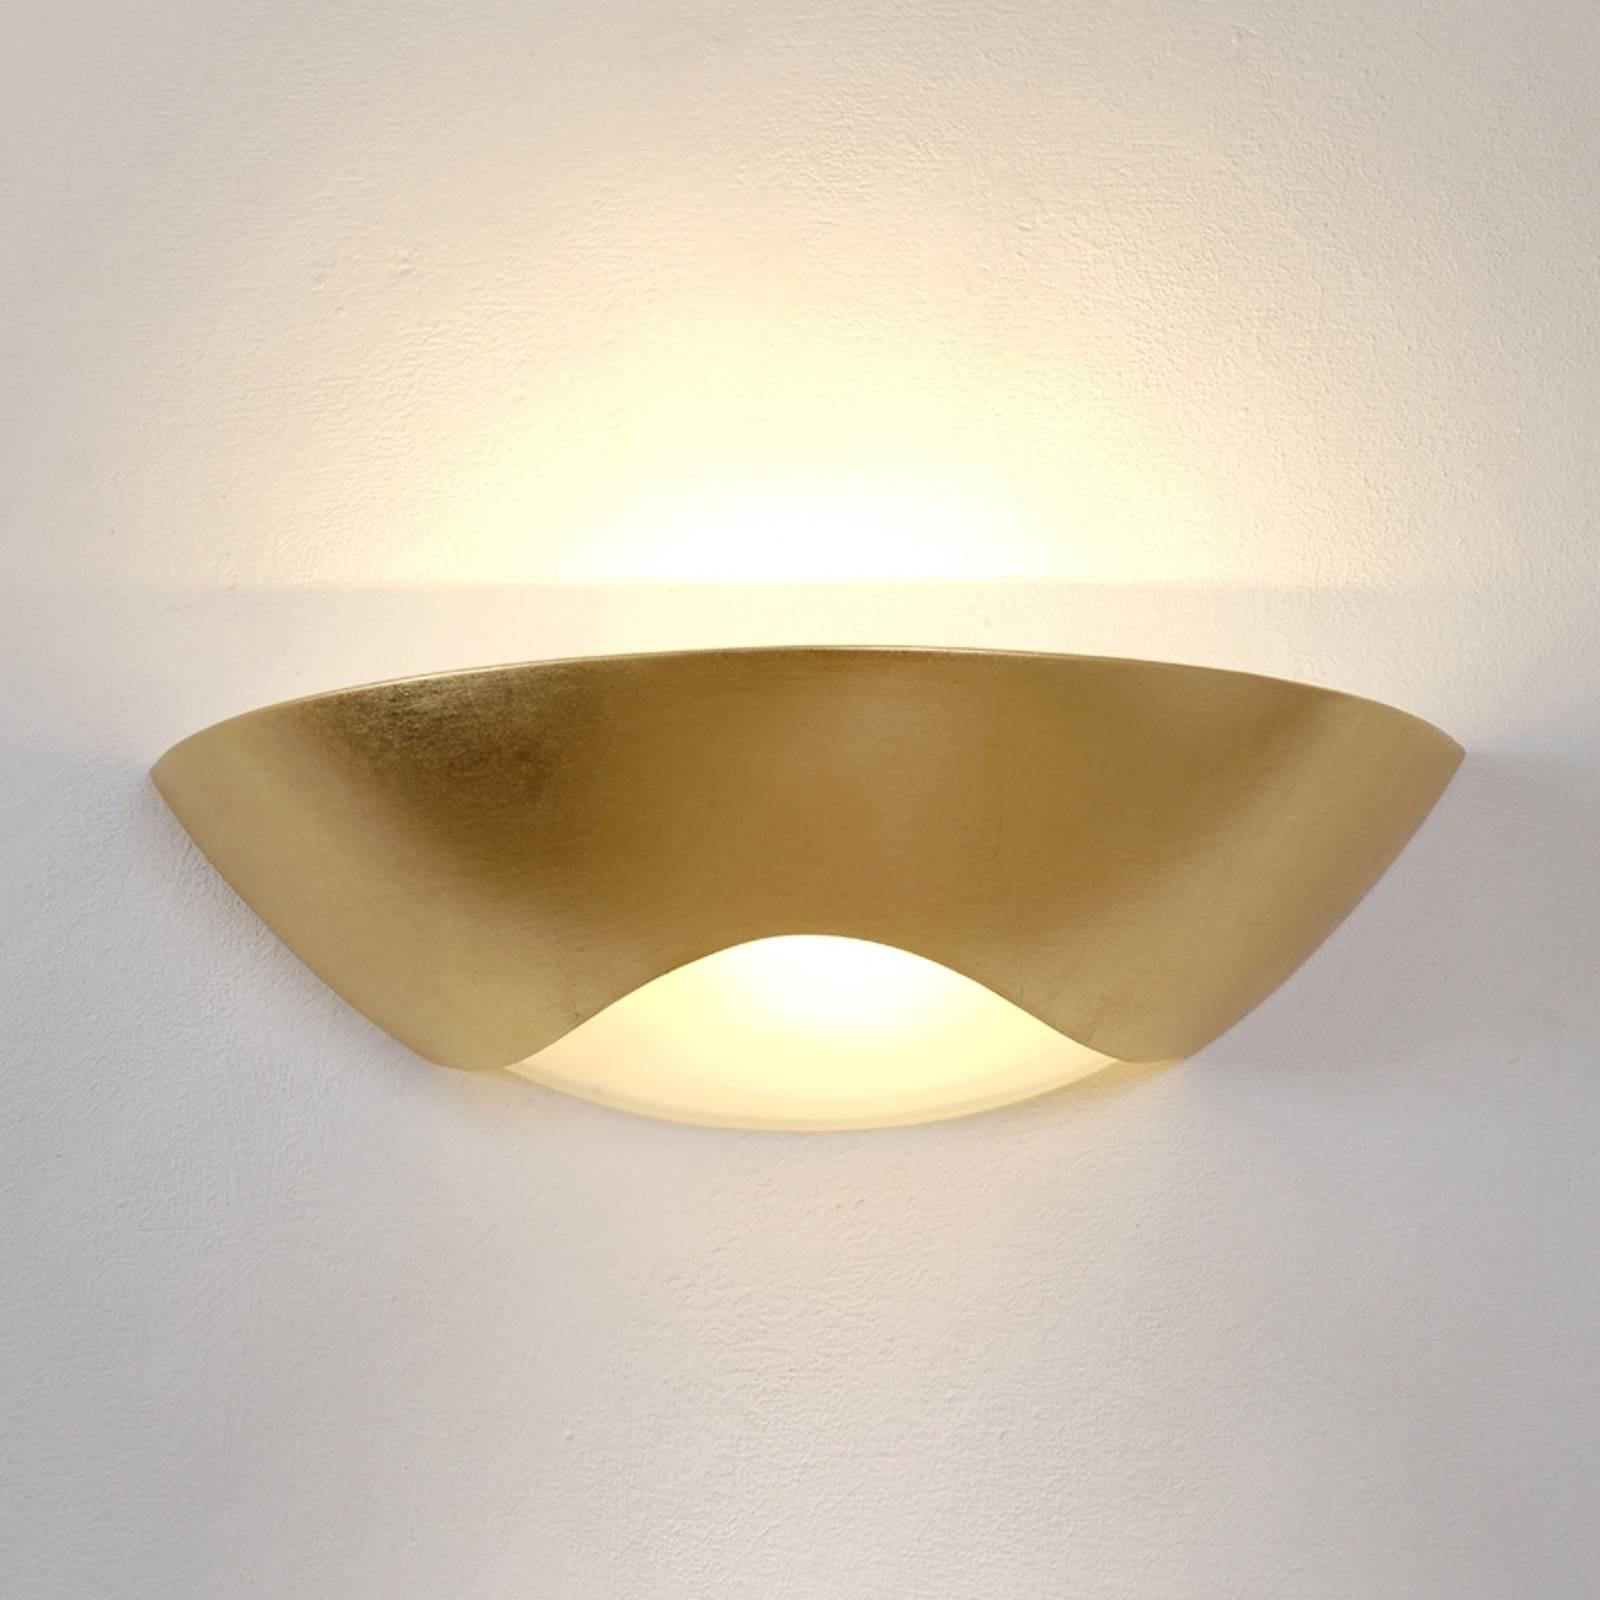 Stijlvolle wandlamp Matteo Curve goud